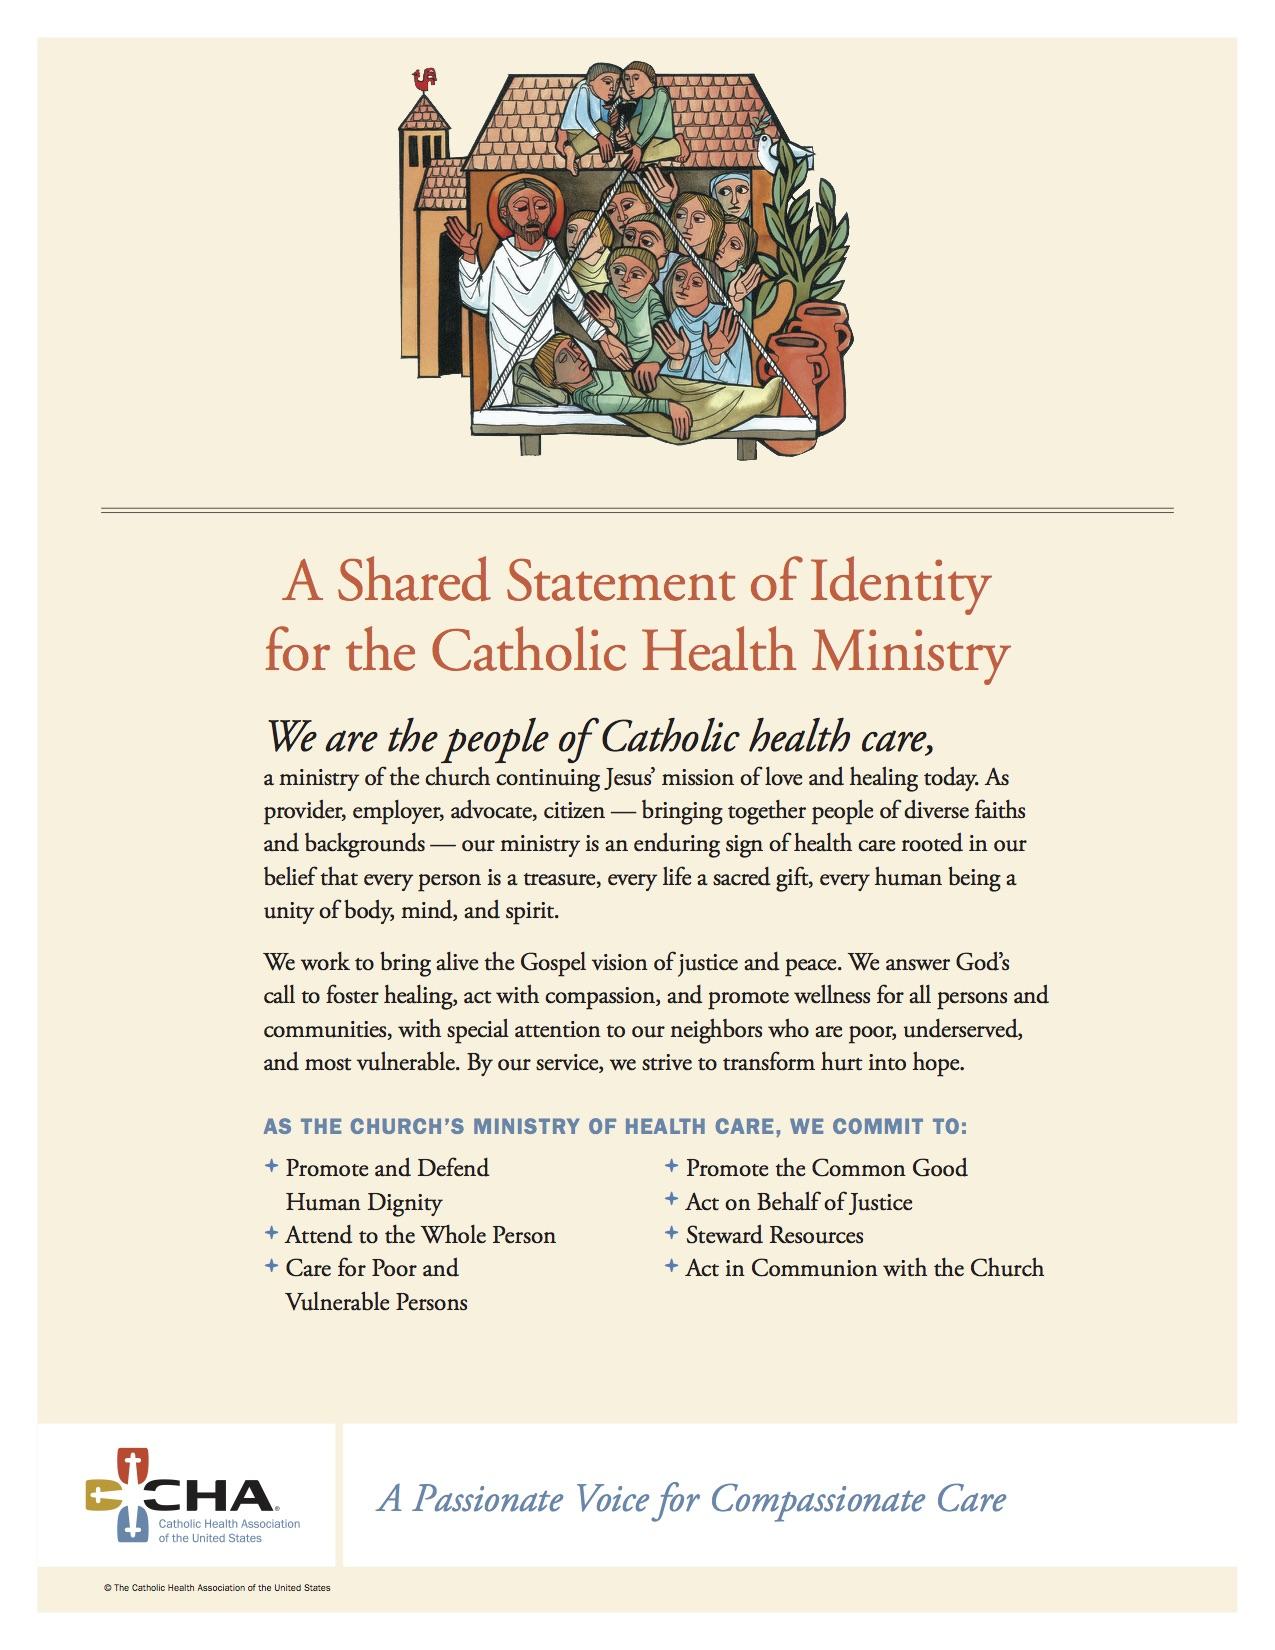 shared-statement-of-identity-flyer-english.jpg